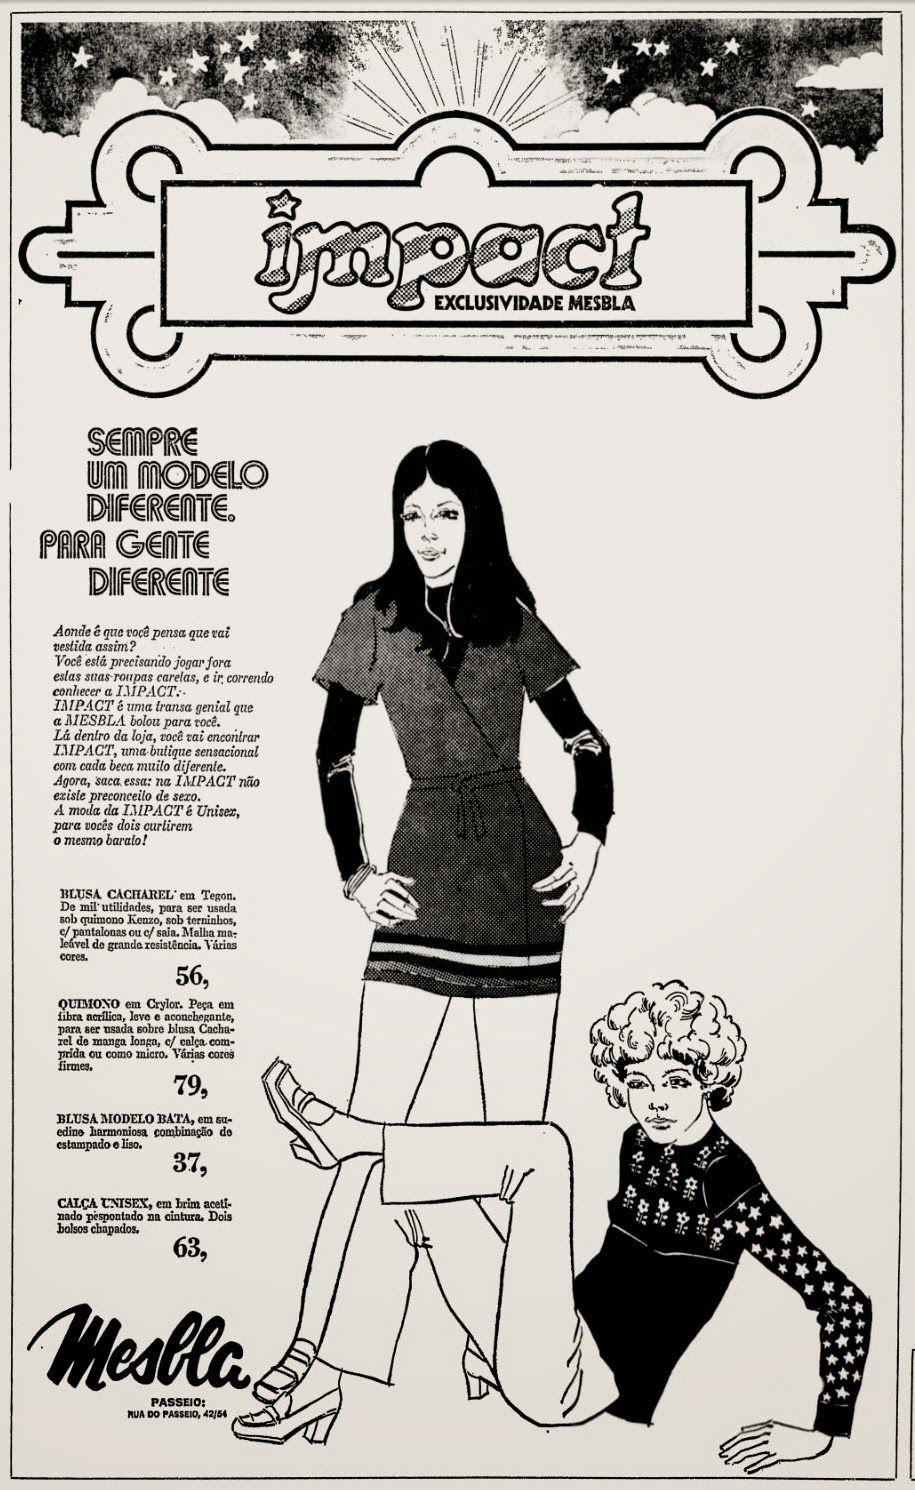 Anúncio moda Impact - 1972